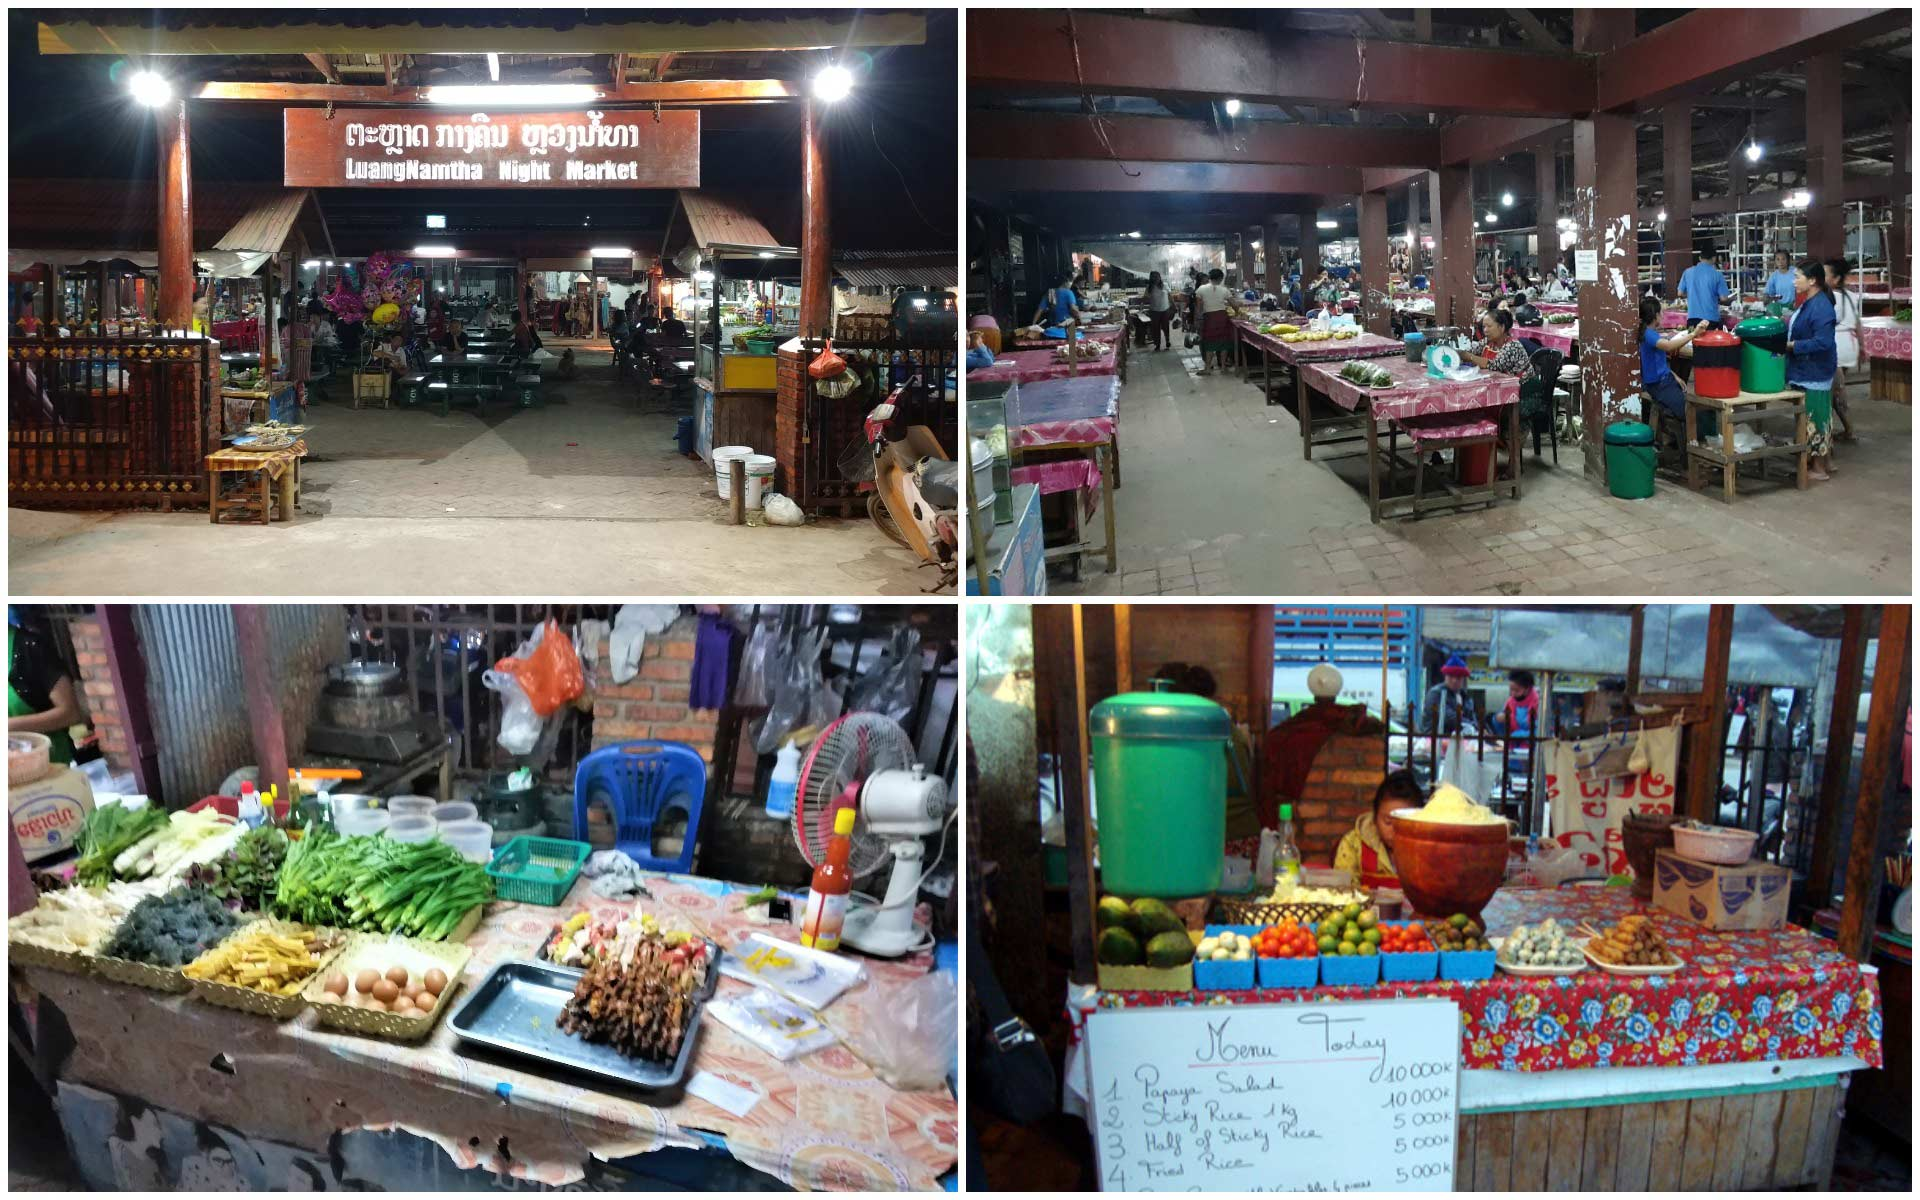 laung namtha night market